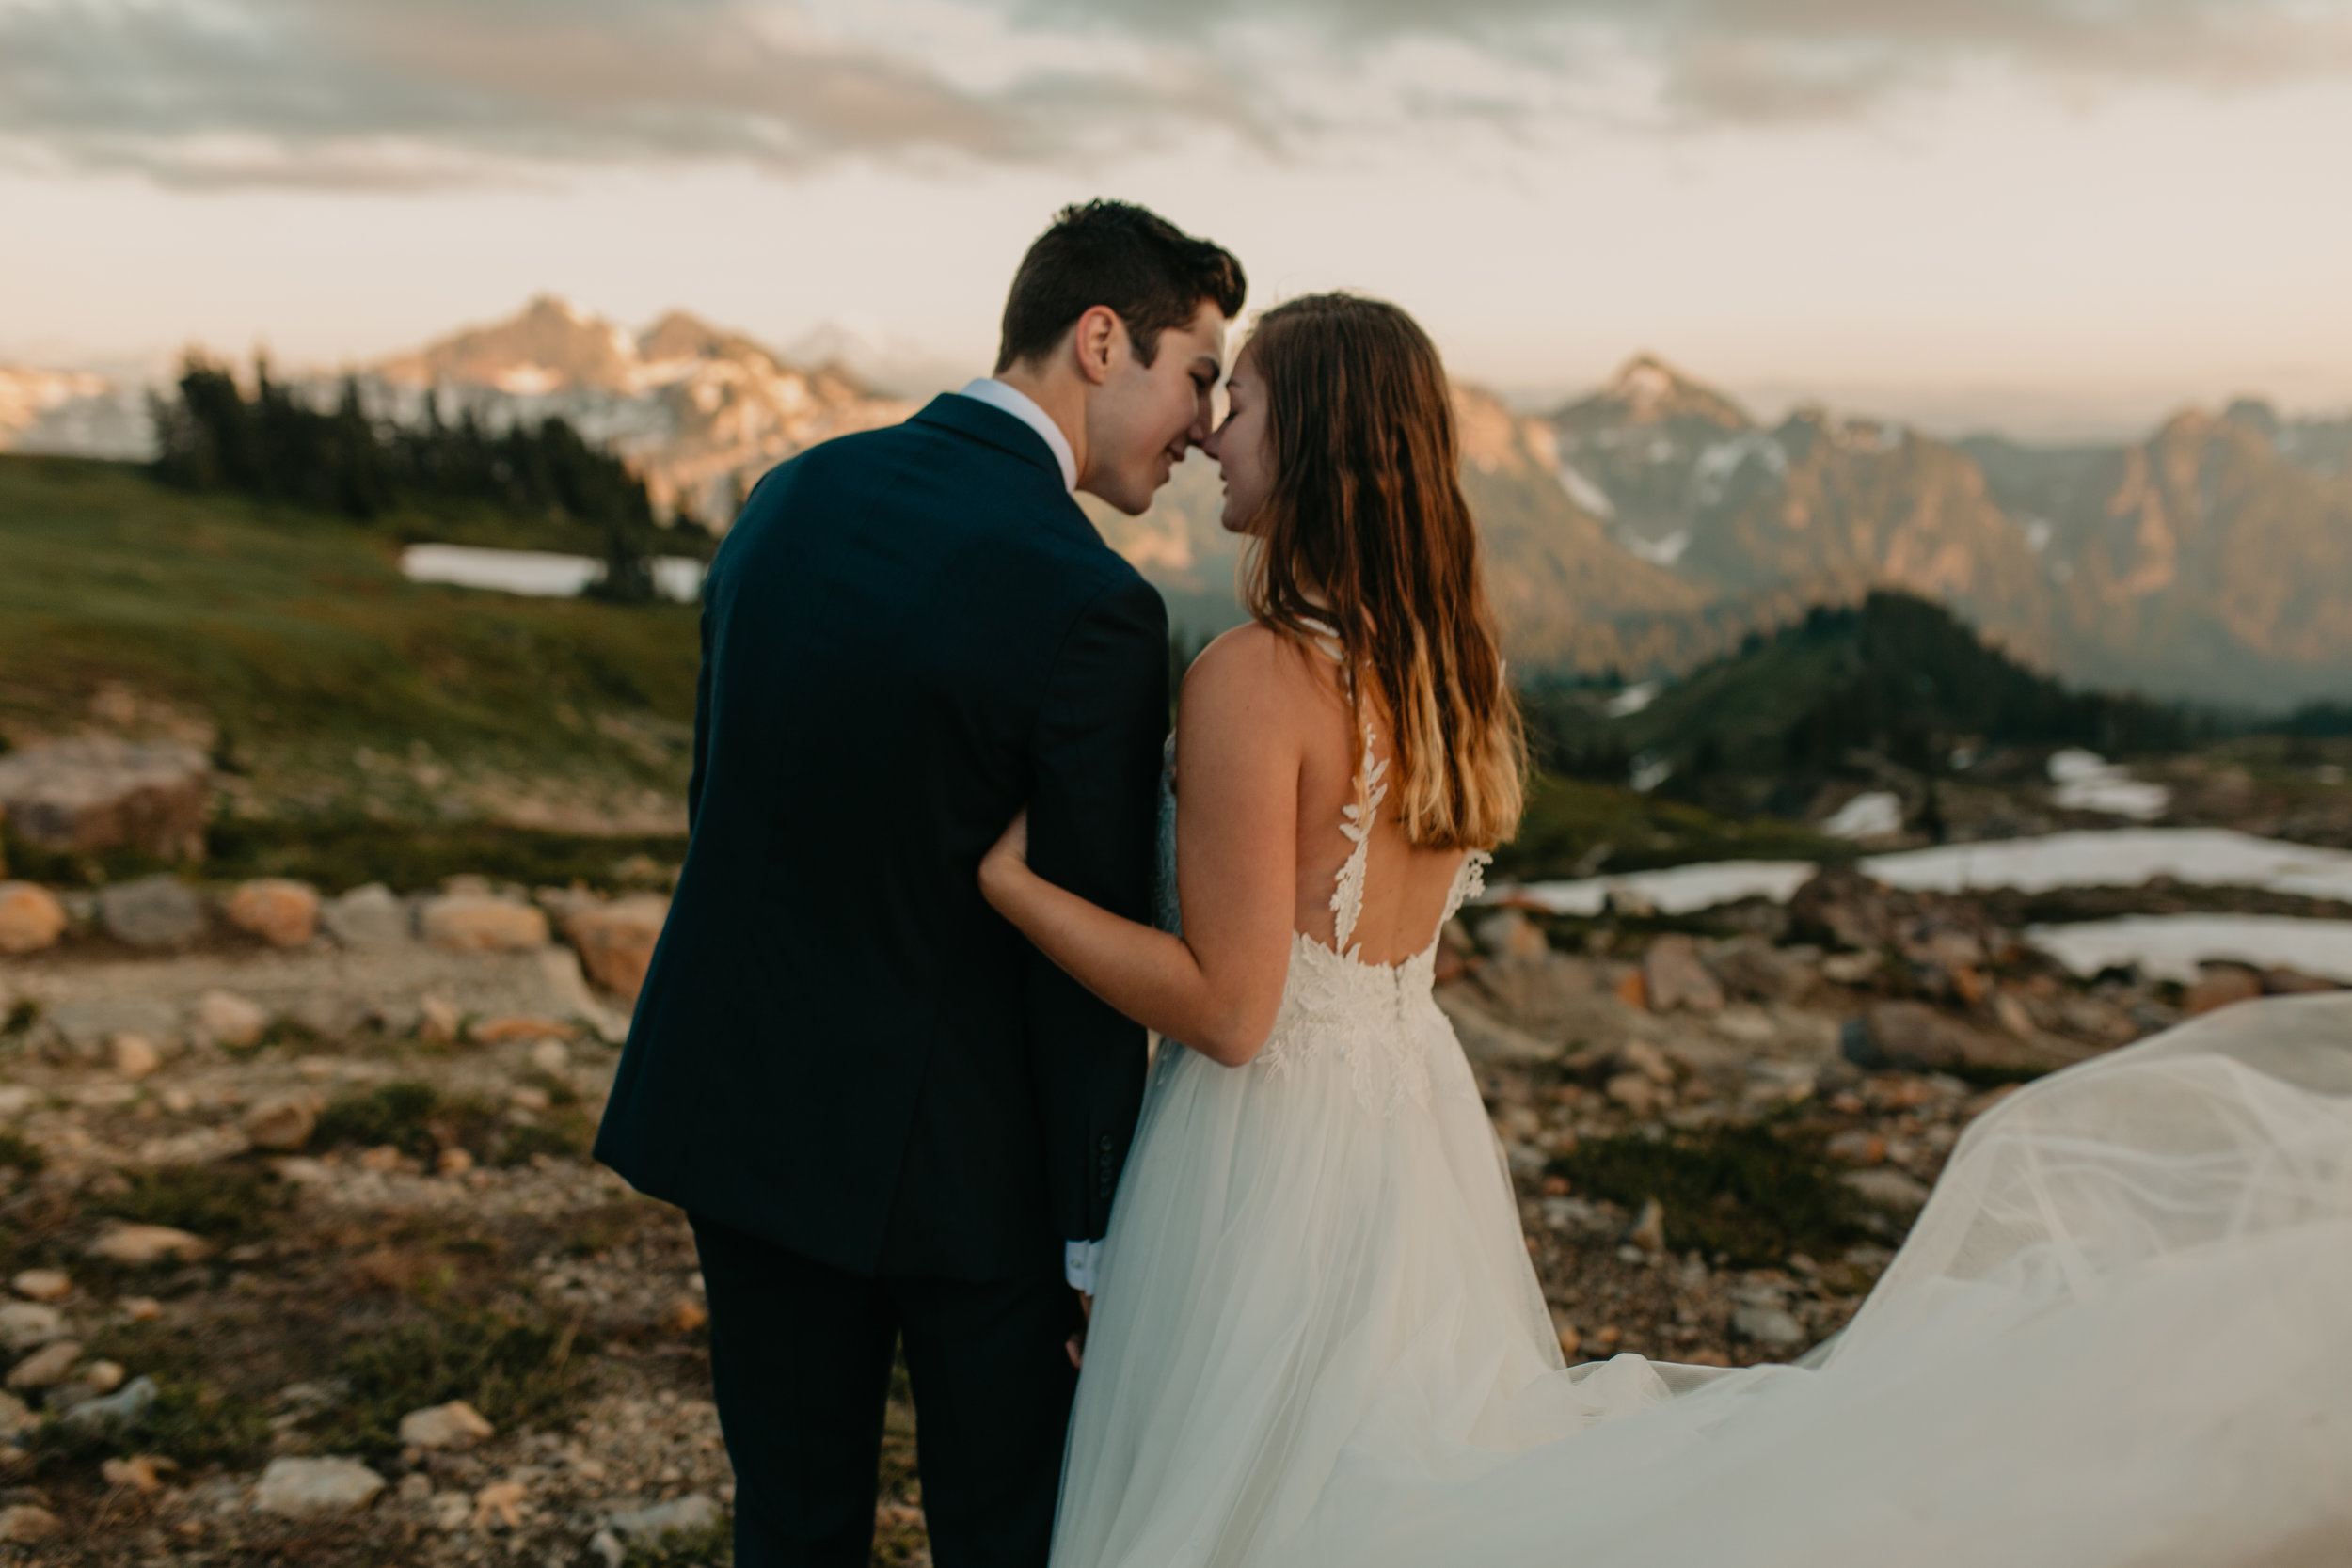 Nicole-Daacke-Photography-Mt-Rainier-elopement-photographer-washington-mountain-epic-wedding-photography-wildflowers-at-rainier-pine-tree-cloudy-summer-day-at-mountain-rainier-46.jpg